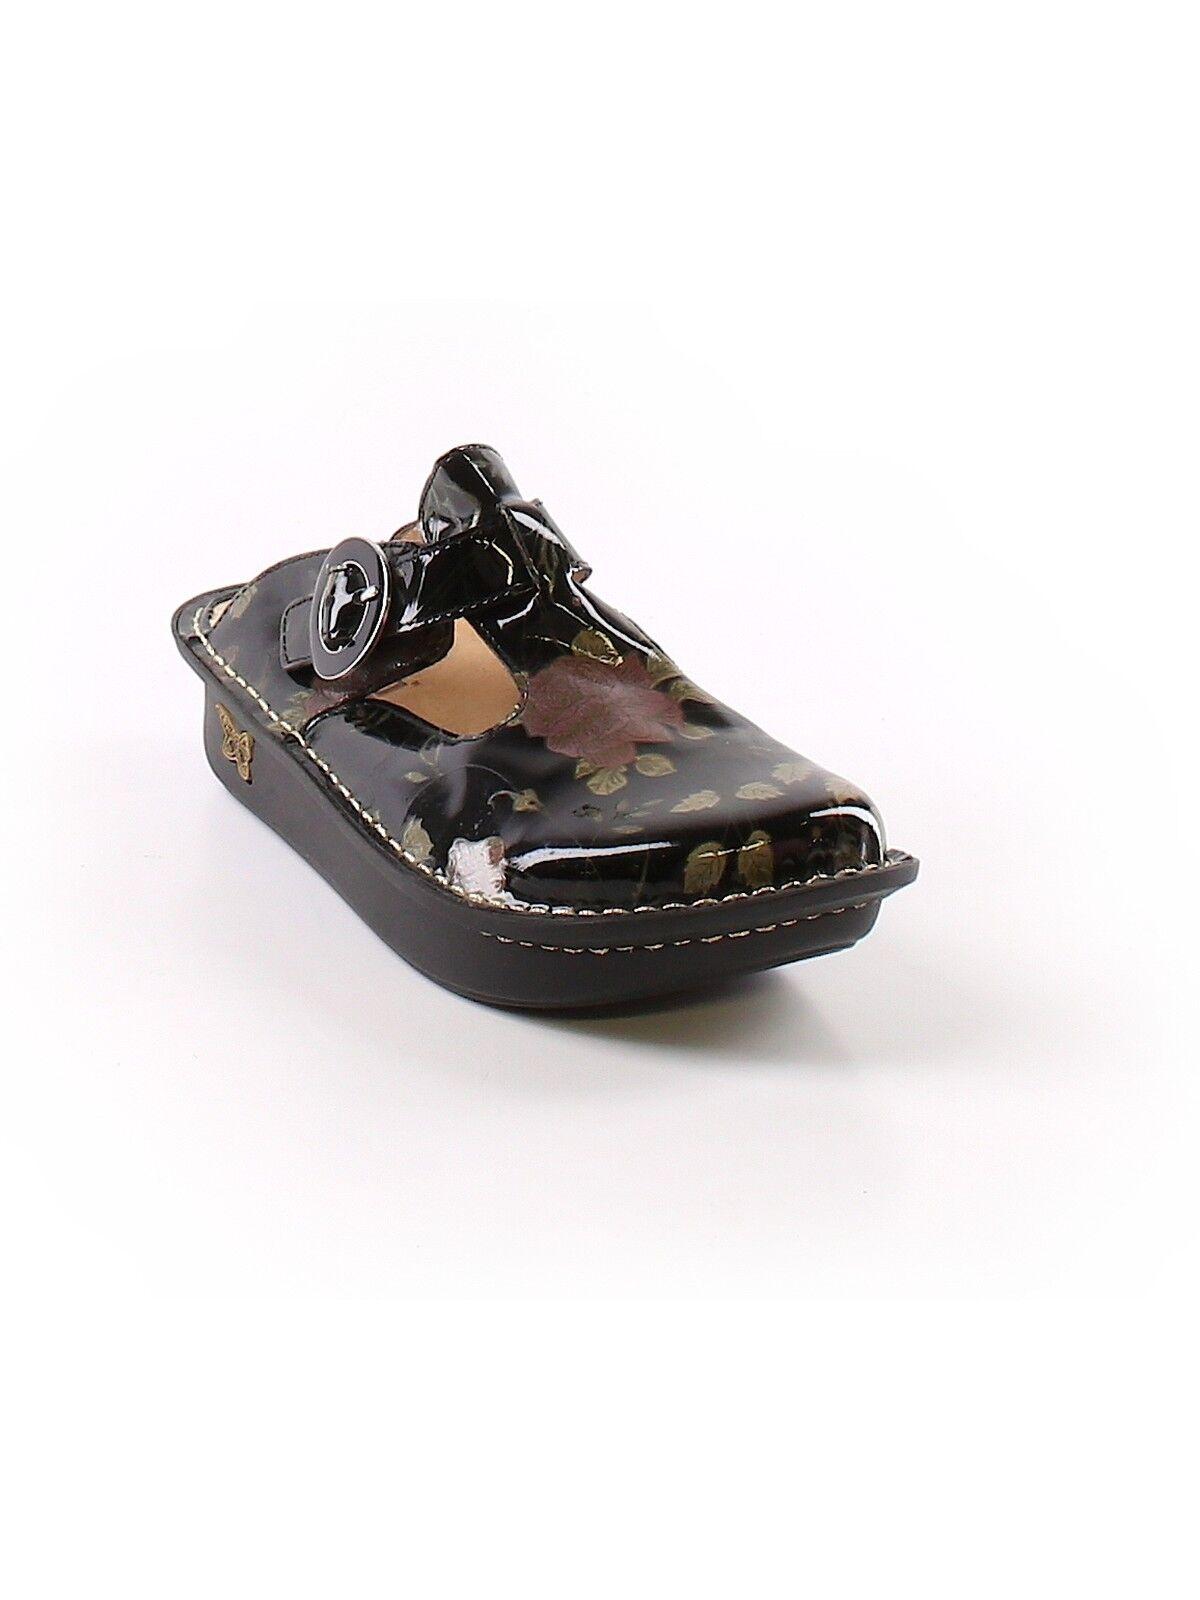 Alegria mujer Clásico Negro Patente rosado diapositiva mula mula mula Obstruir Zapato ALG-504 Talla 36  tienda